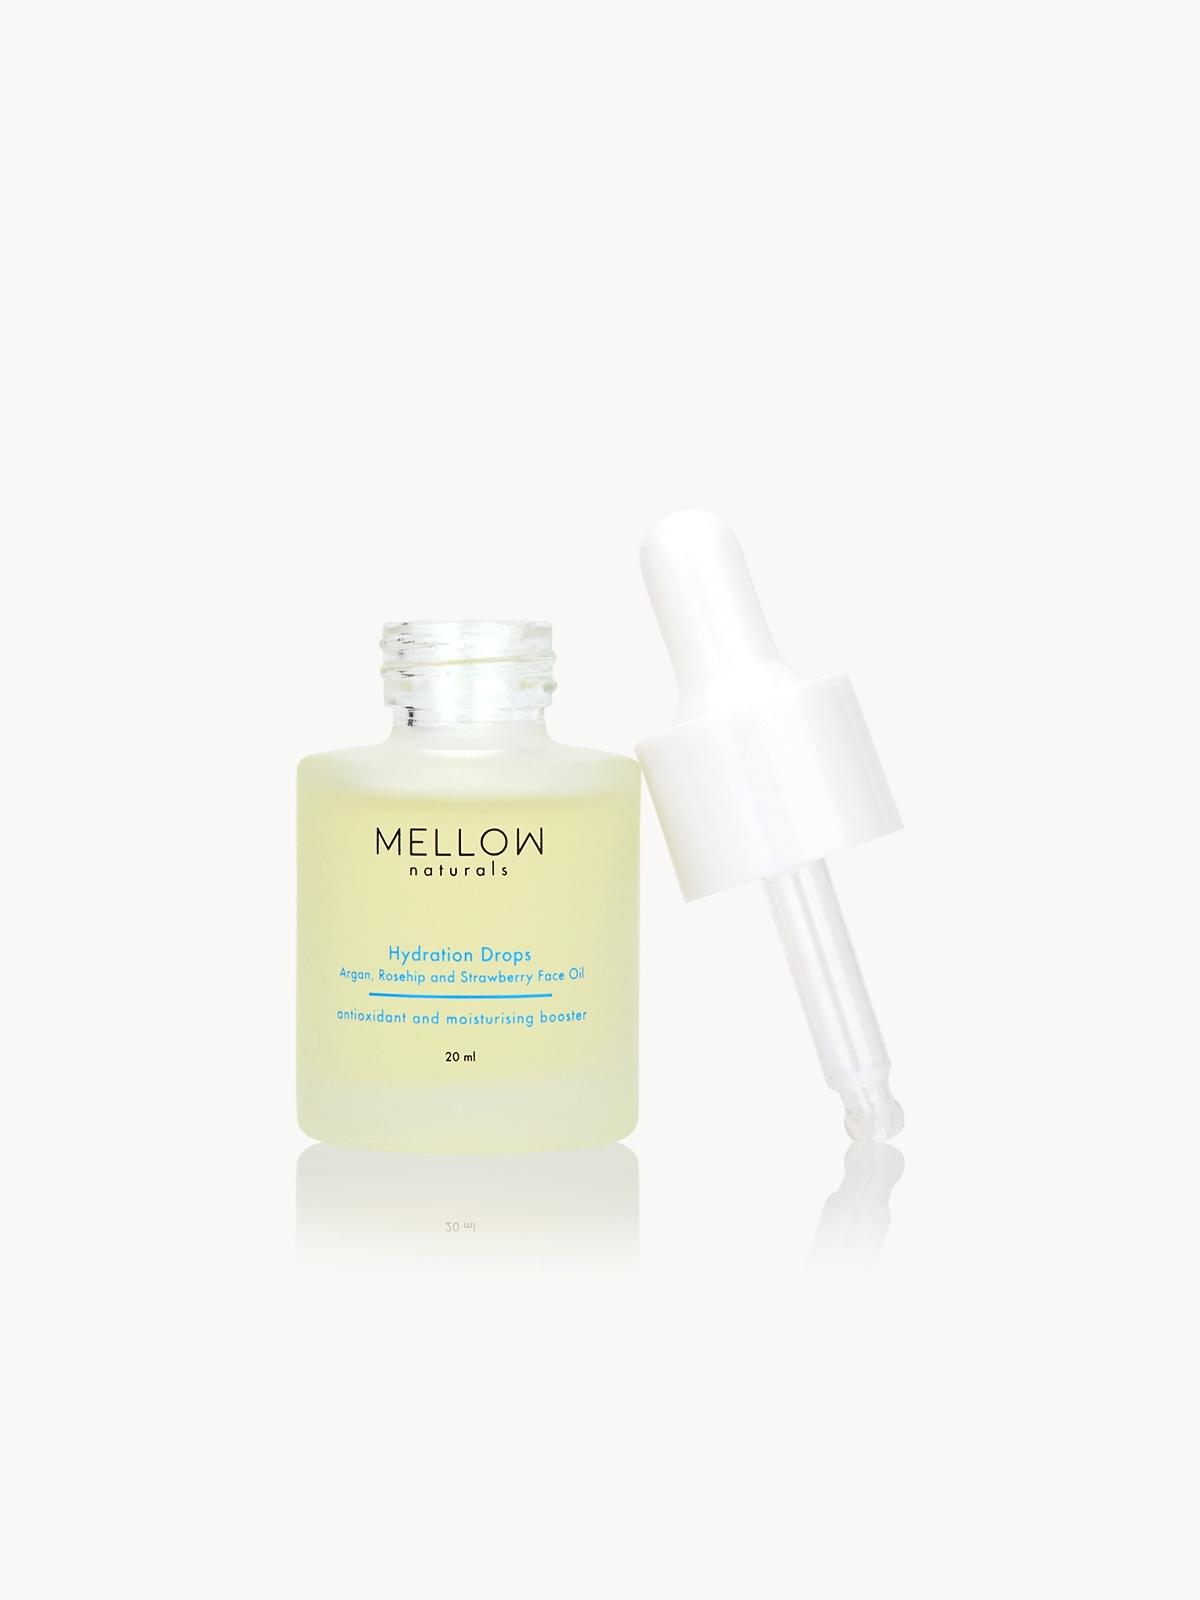 MELLOW Naturals Hydration Drops Face Oil